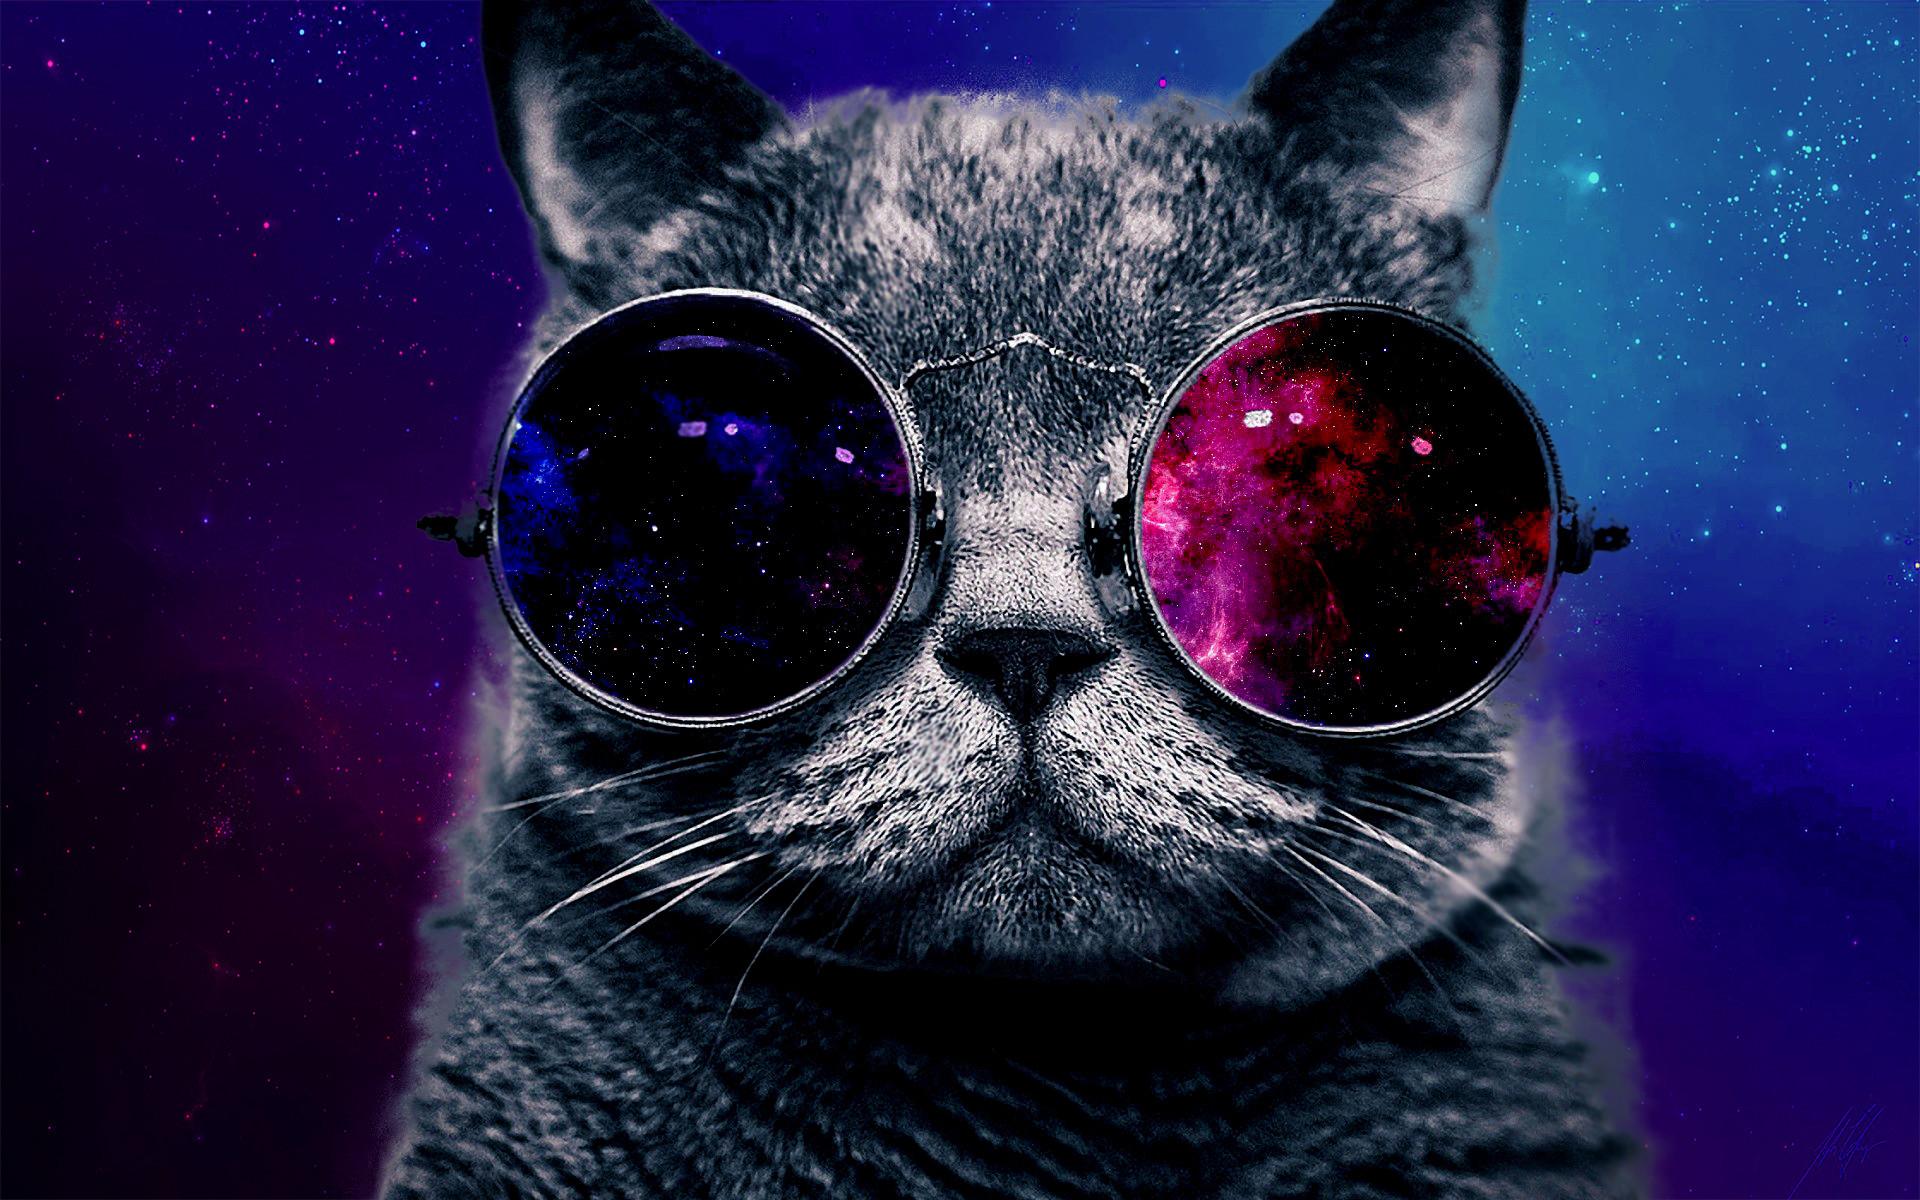 25 Best Ideas about Space Cat on Pinterest | Galaxy cat, Cat .